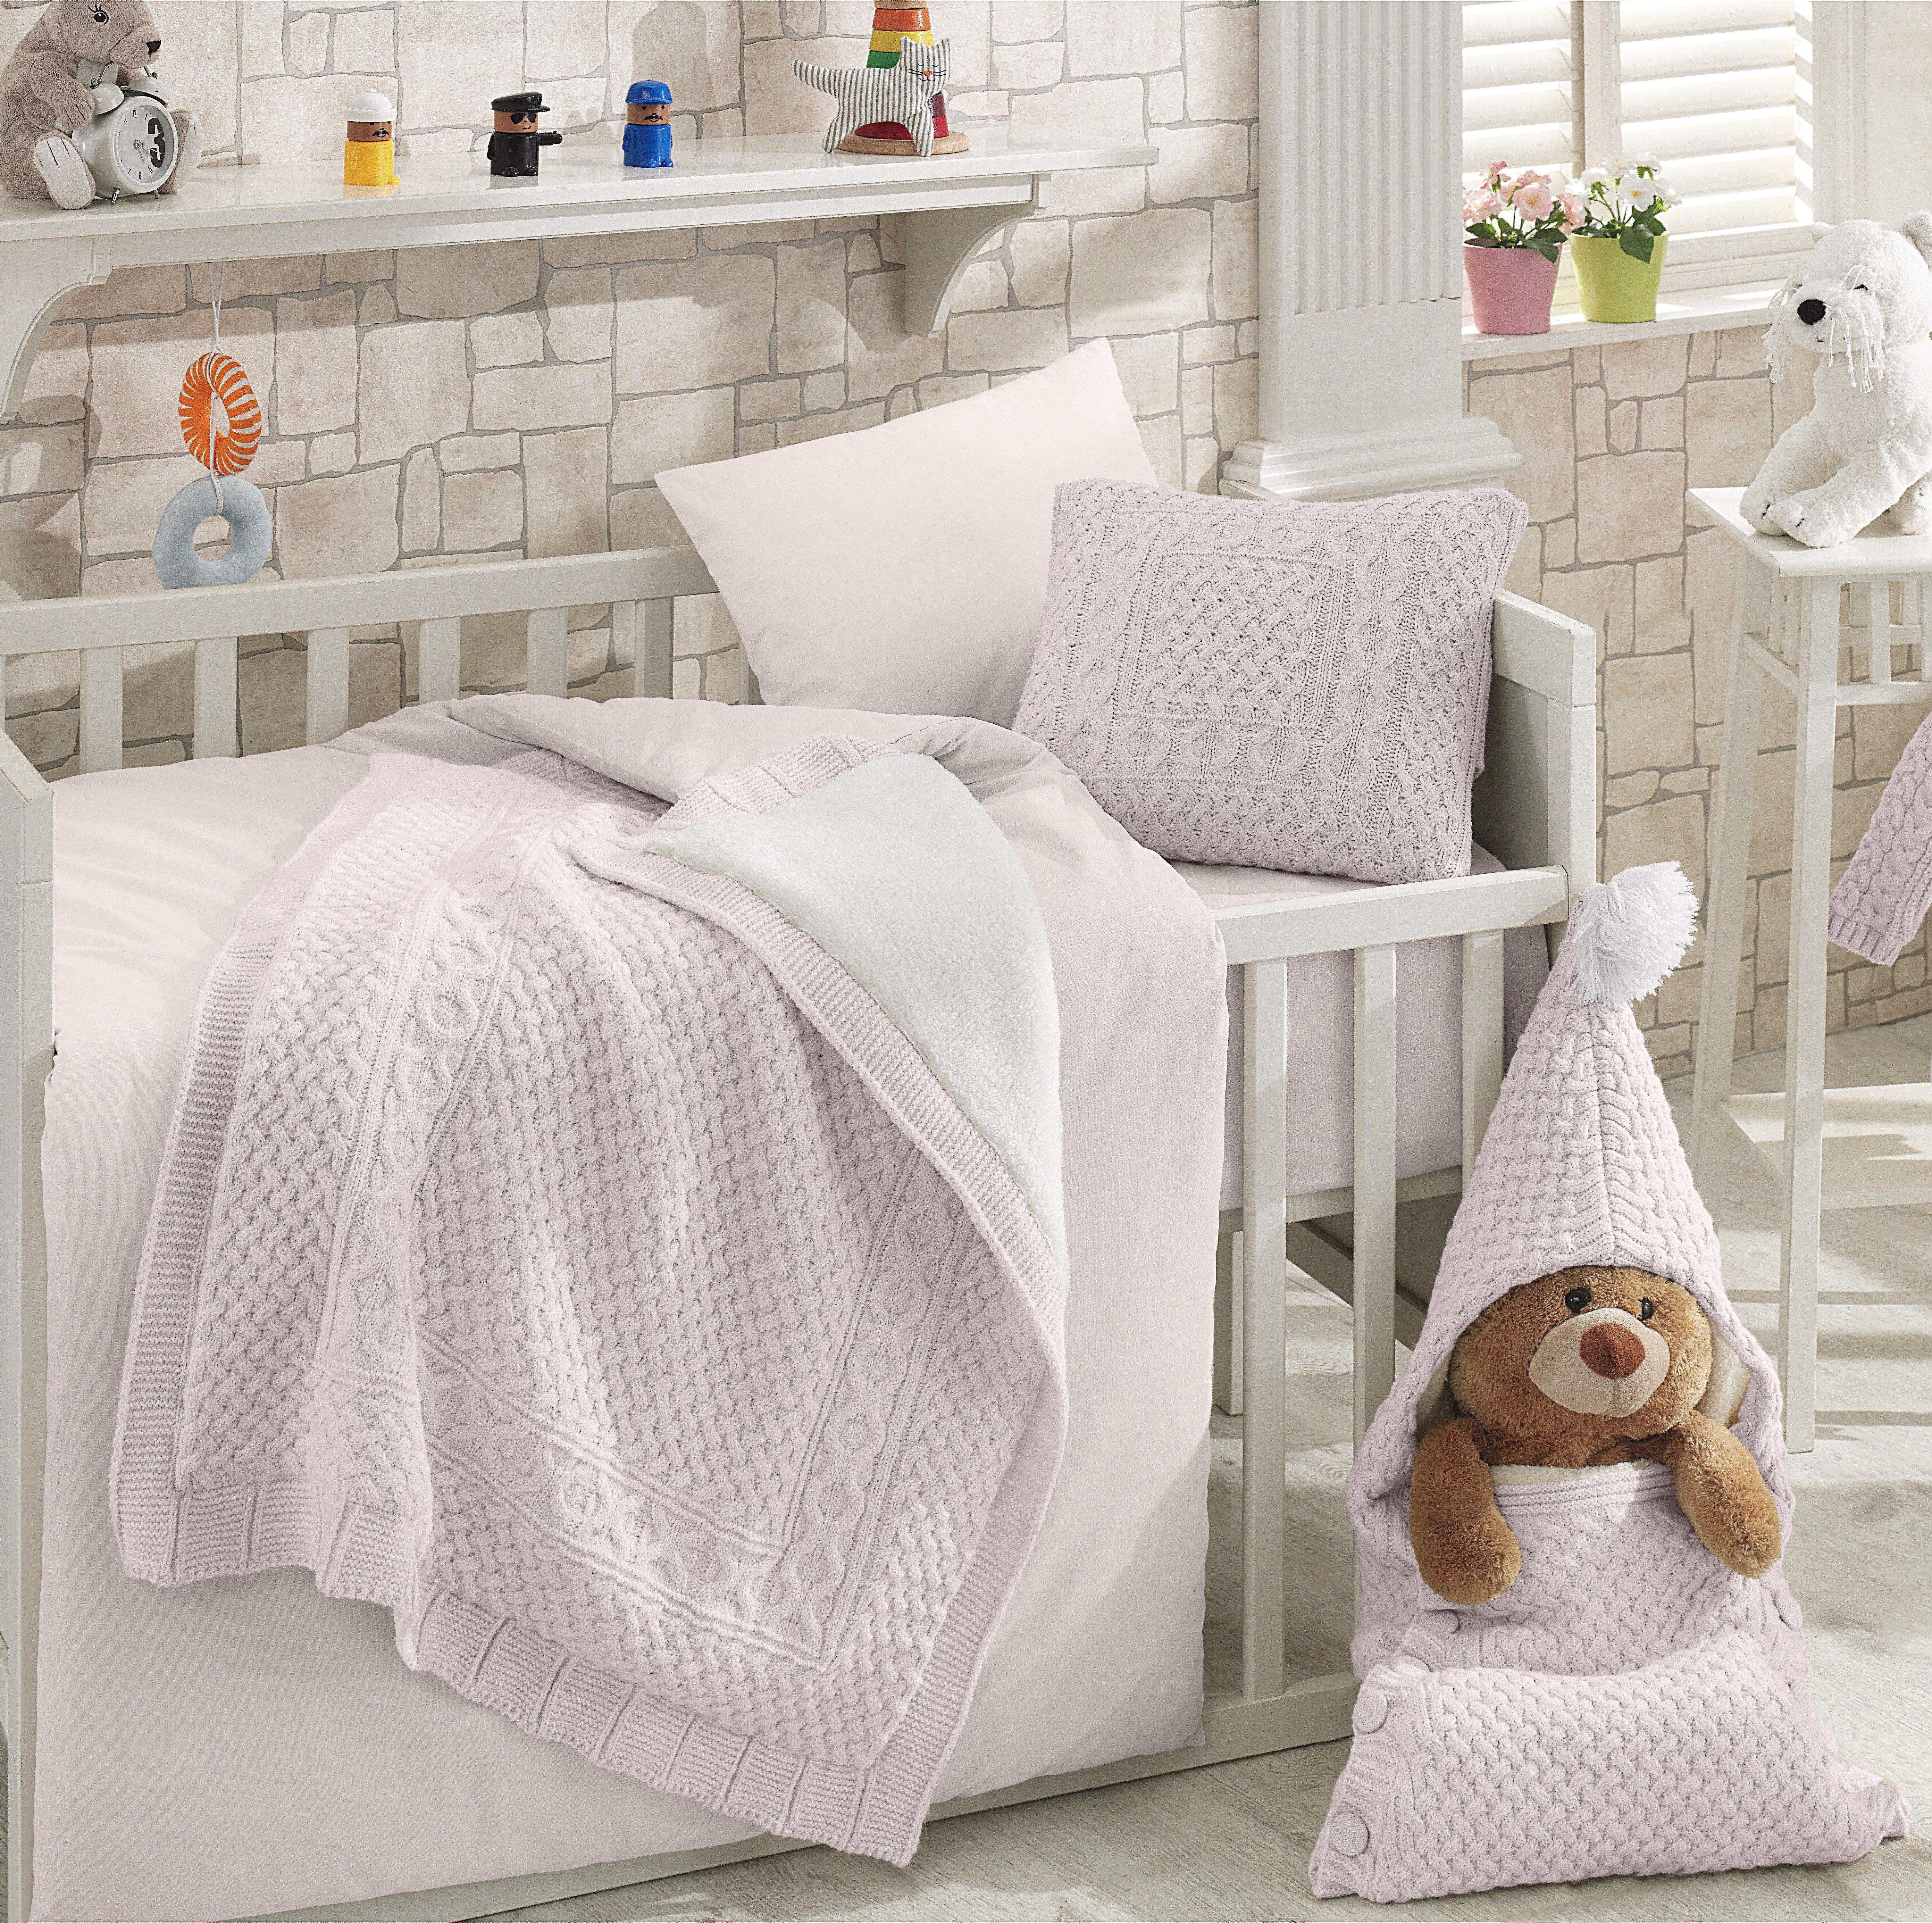 Crib Bedding Sets You Ll Love In 2021 Wayfair